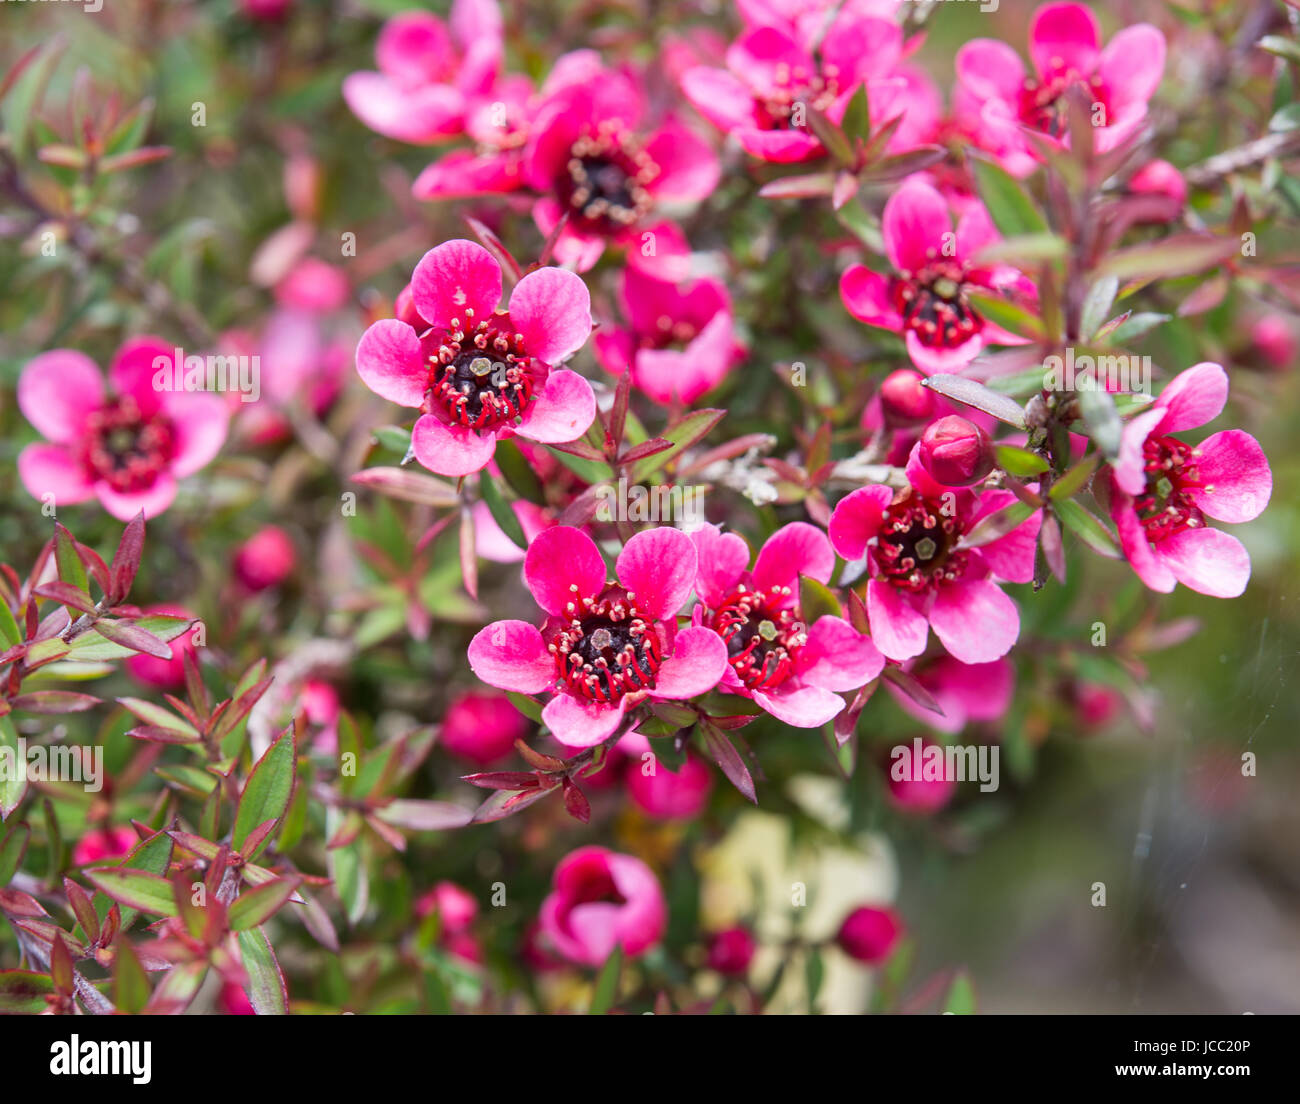 Rosa Manuka Busch Blumen Stockbild